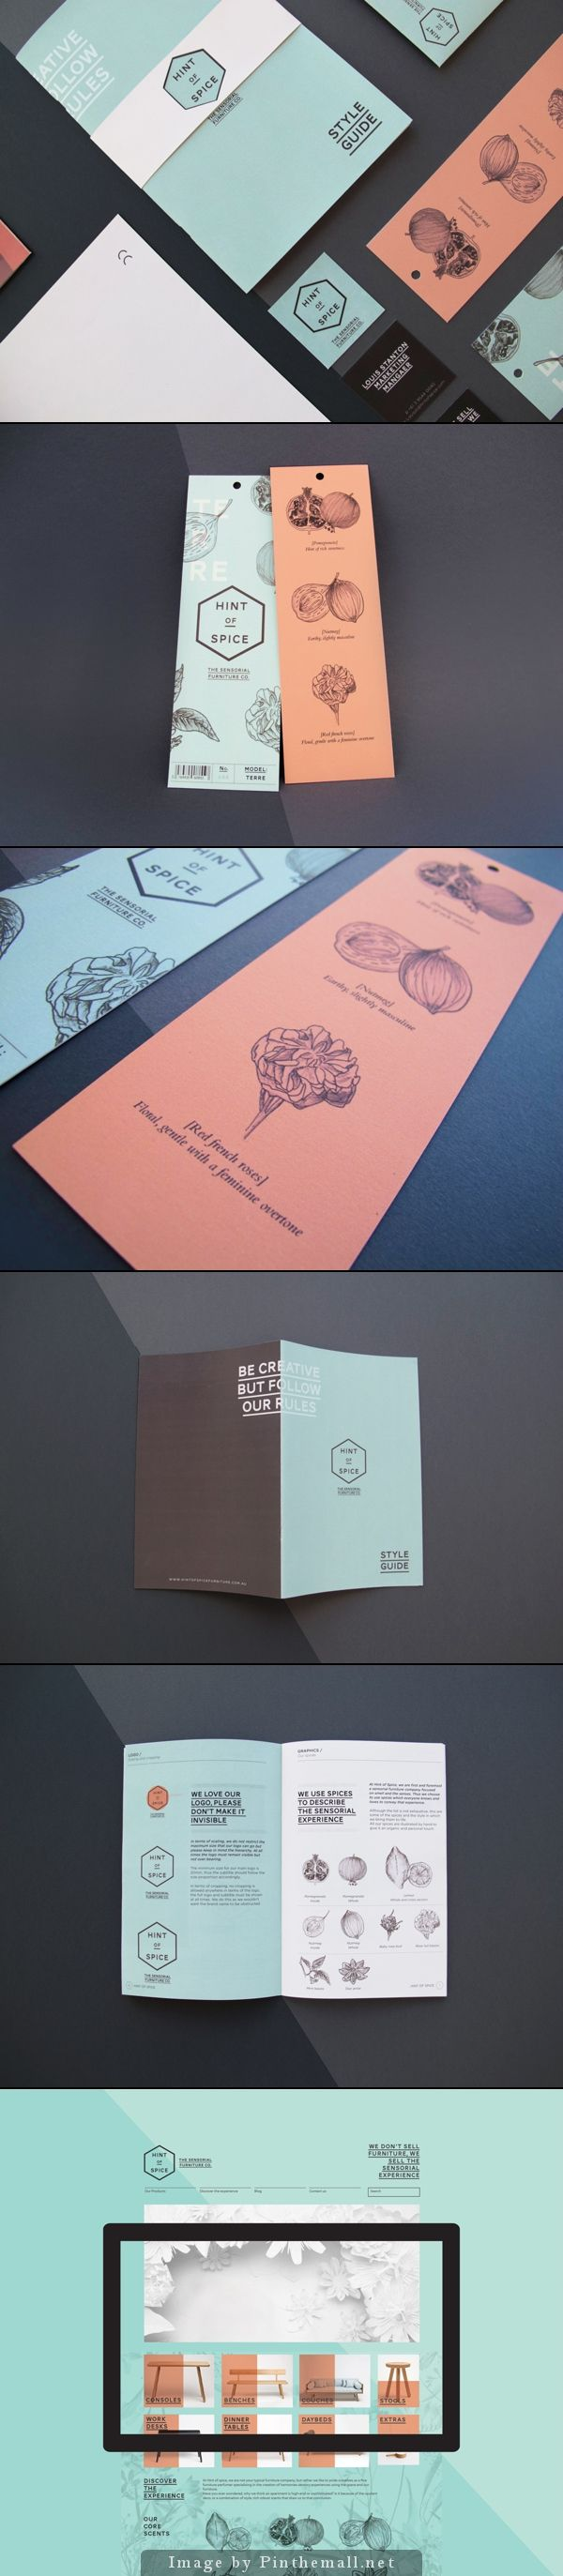 Brand Identity, Hint of Spice Furniture Co. #branding #brandidentity #design http://www.pinterest.com/designeurnet/